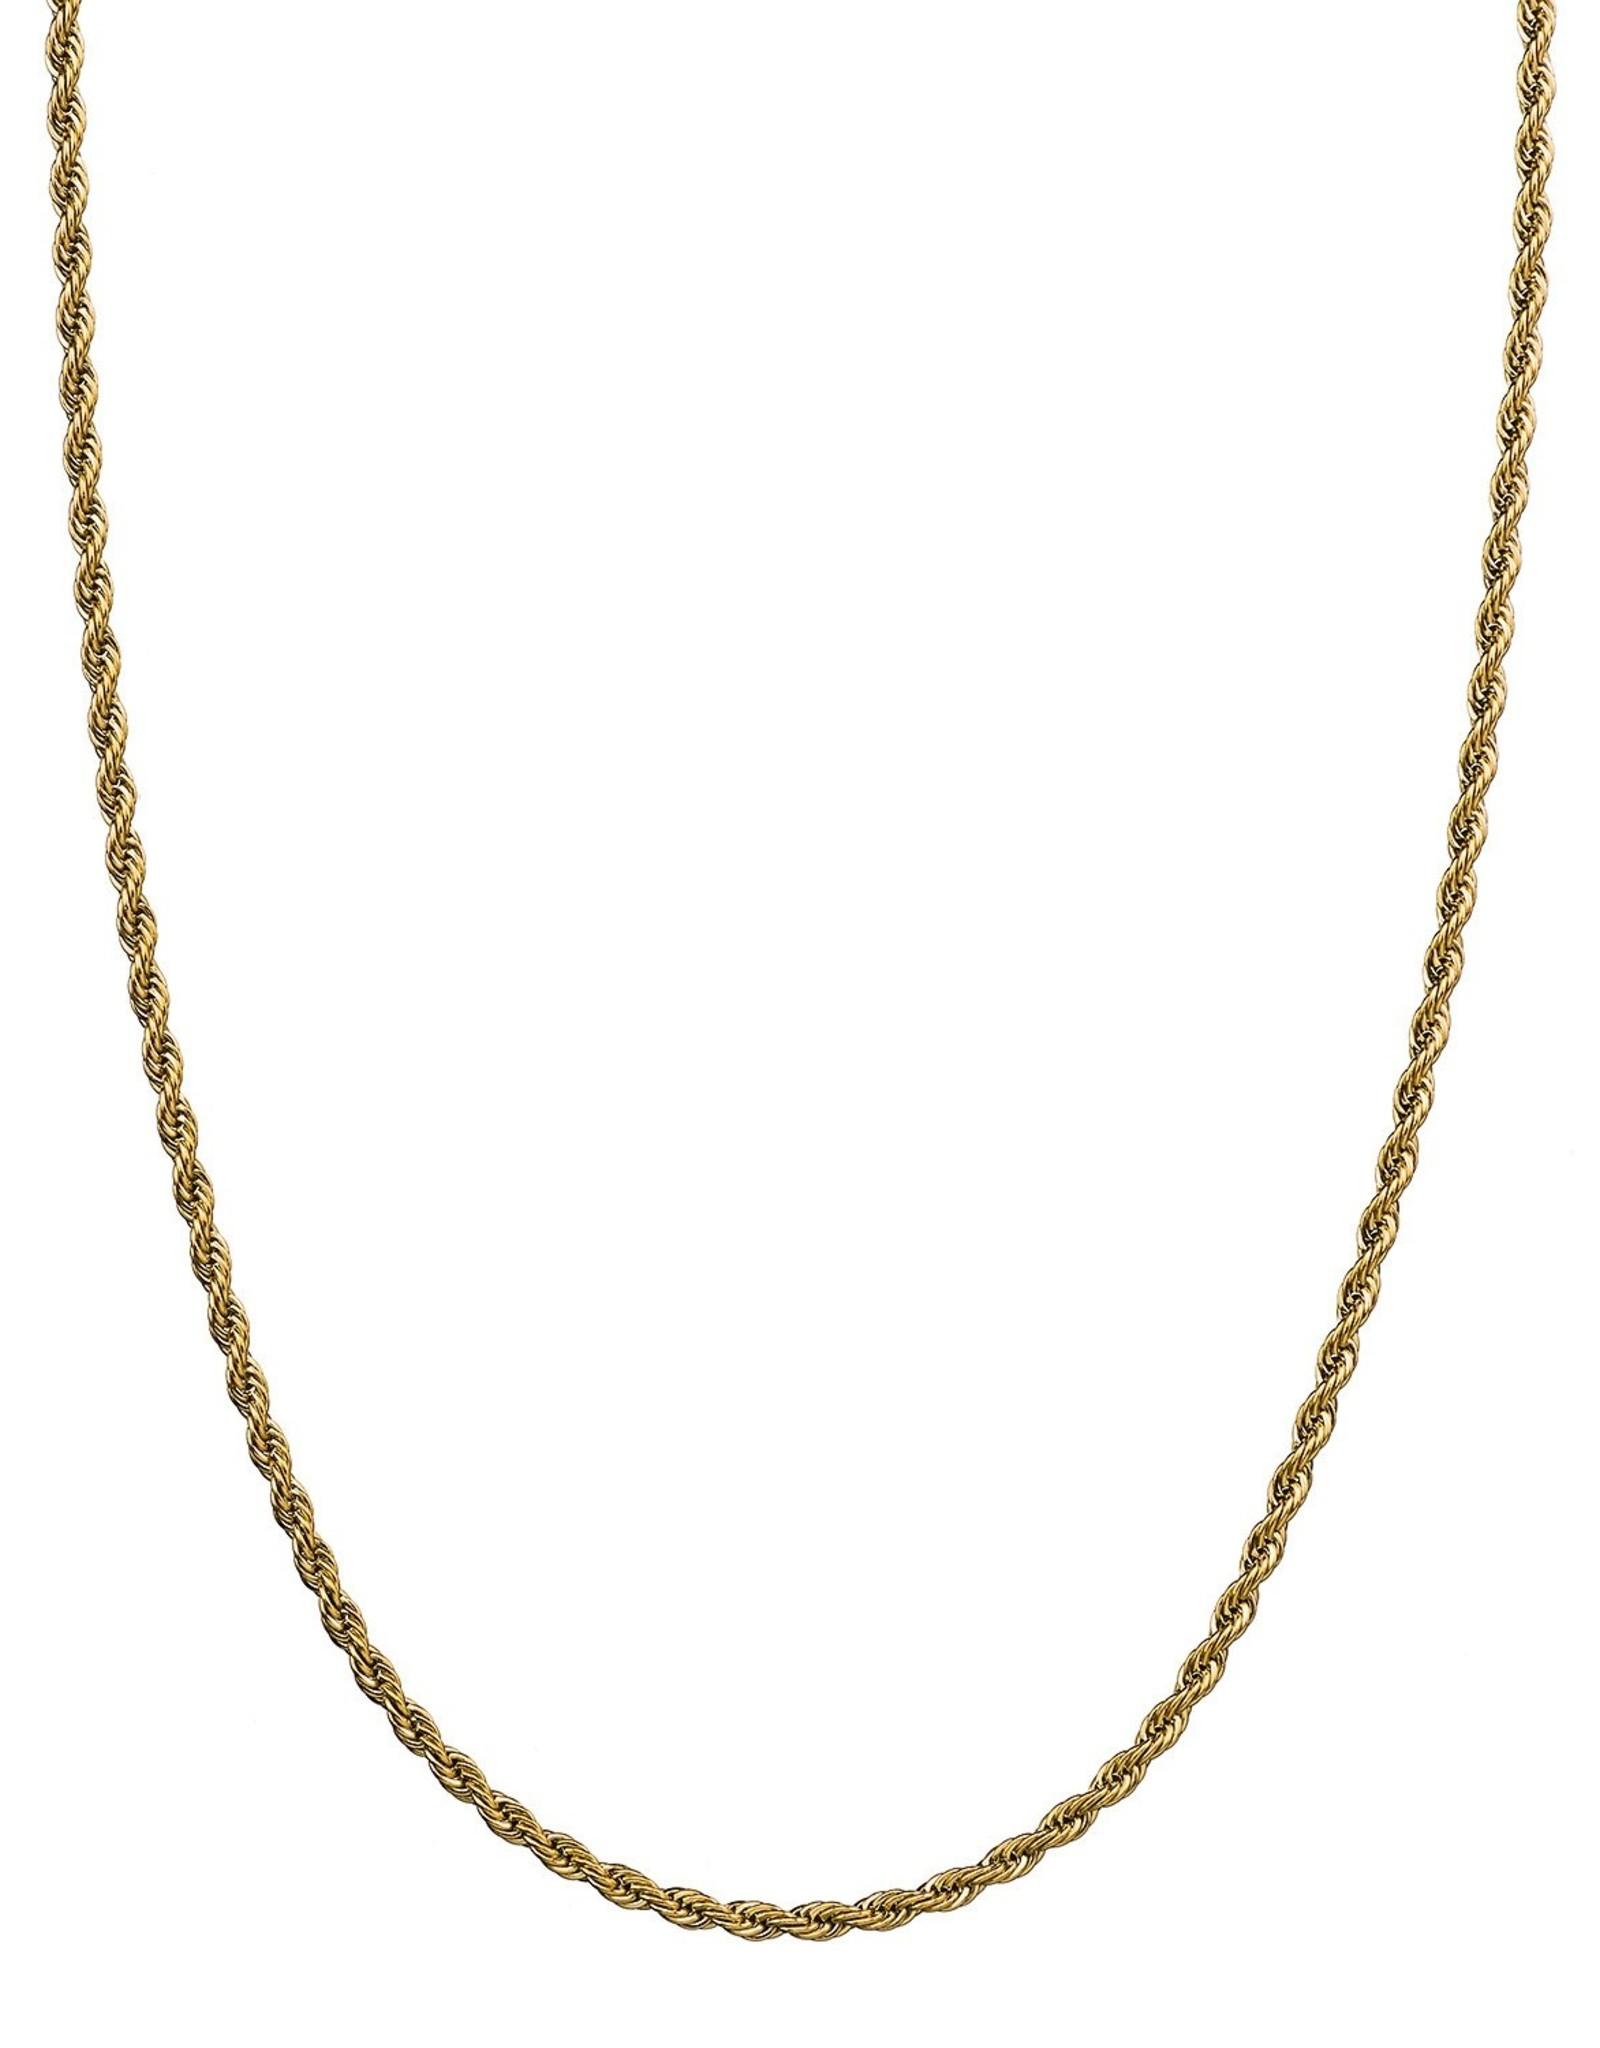 Croyez Chain rope 3mm 14k gold 55cm